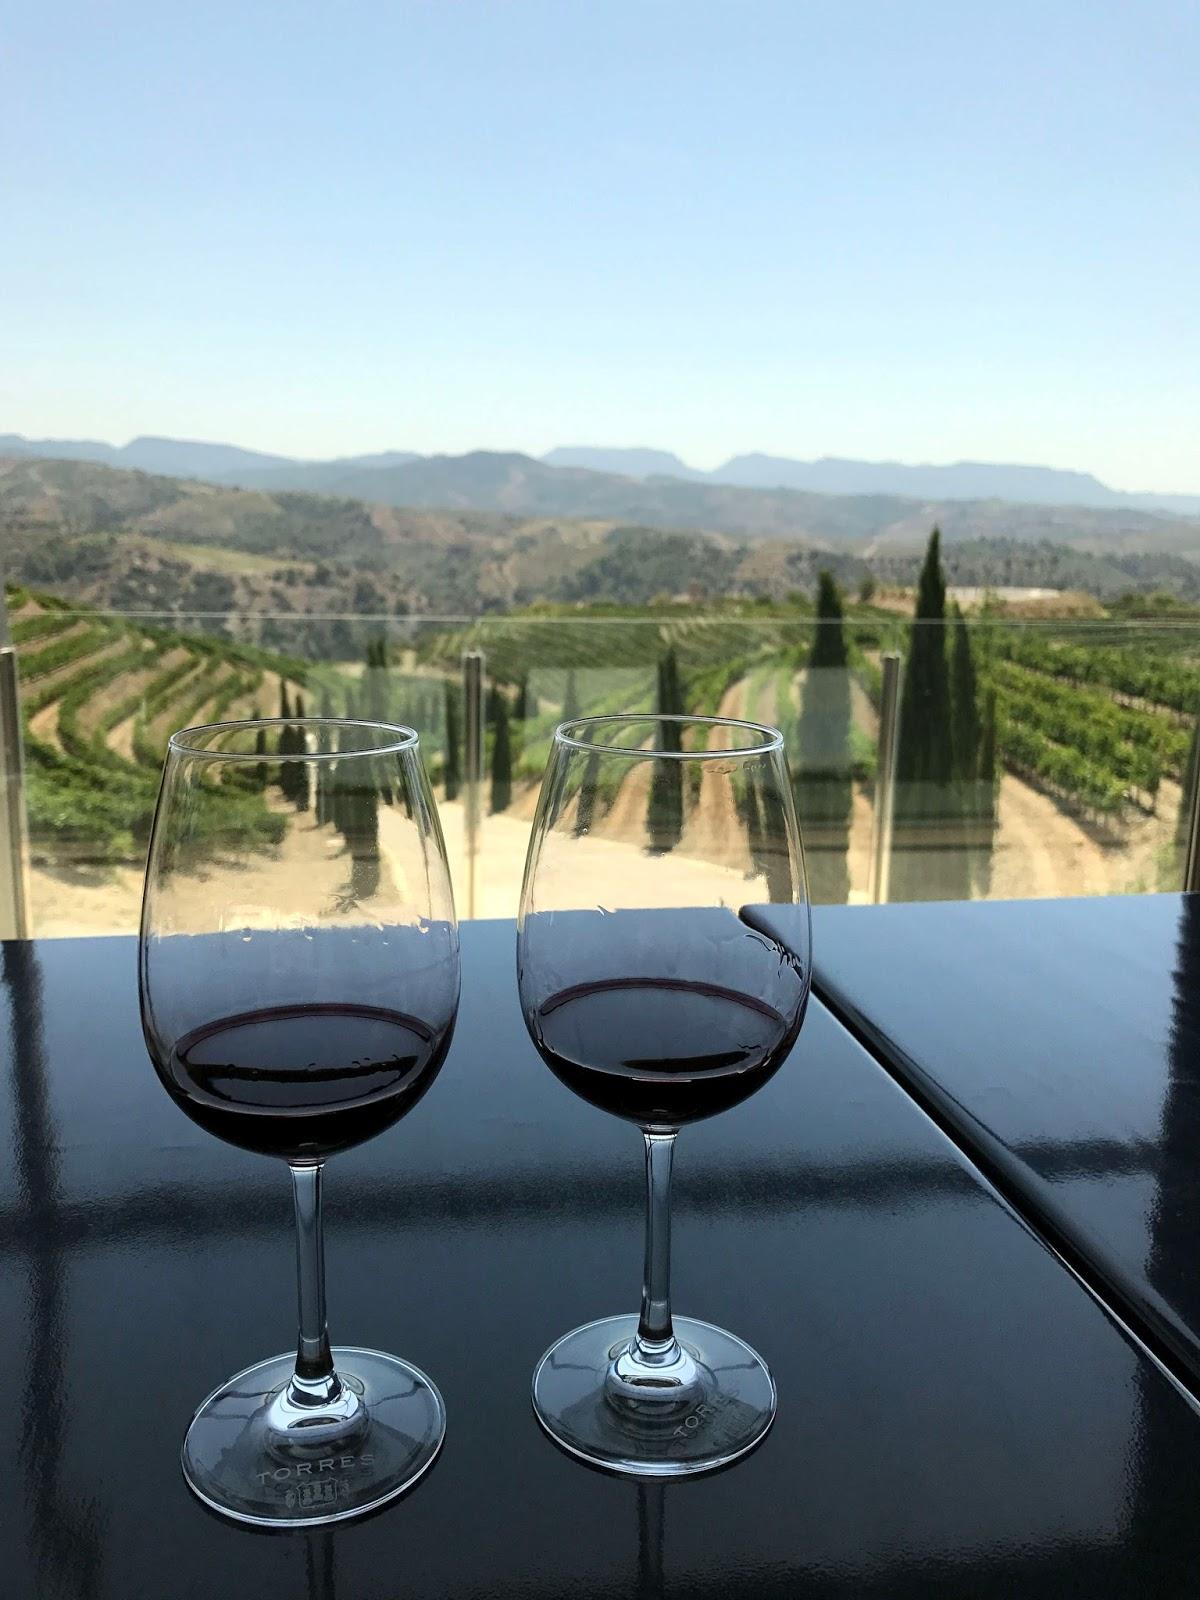 Stitch & Bear - Torres Priorat - Tasting overlooking the vineyards